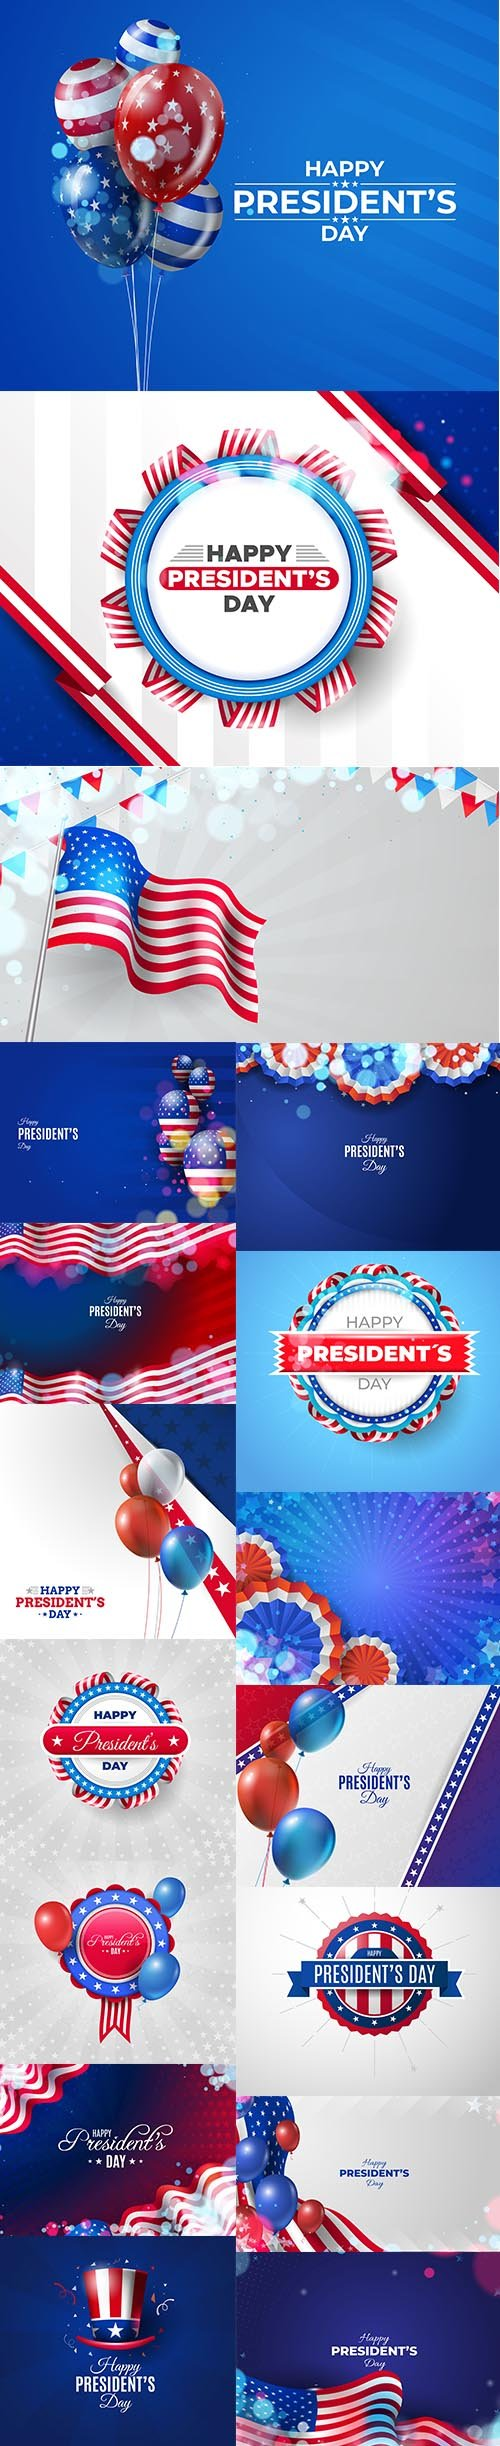 USA Presidents Day Premium Illustrations Set